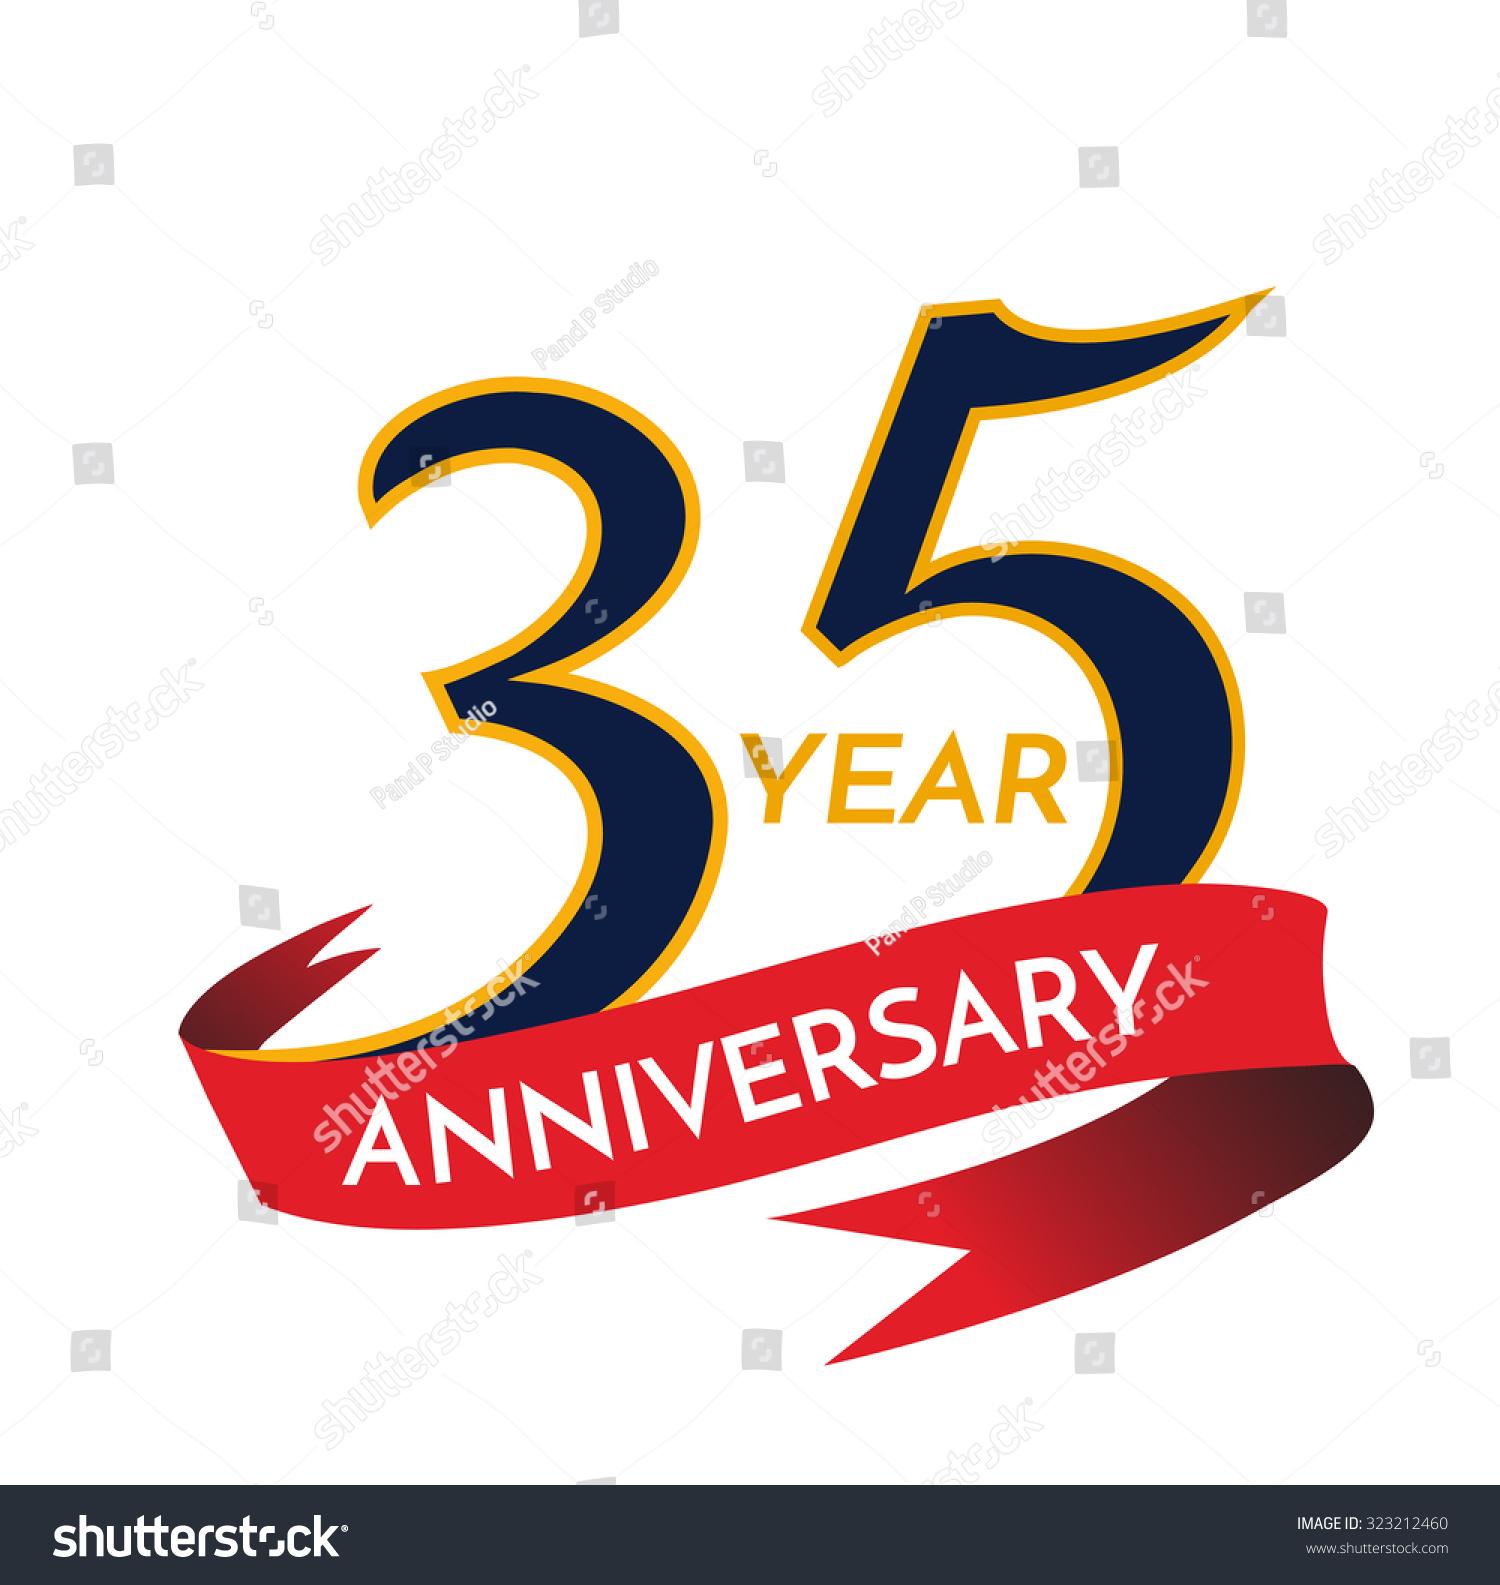 anniversary logo vector - photo #16